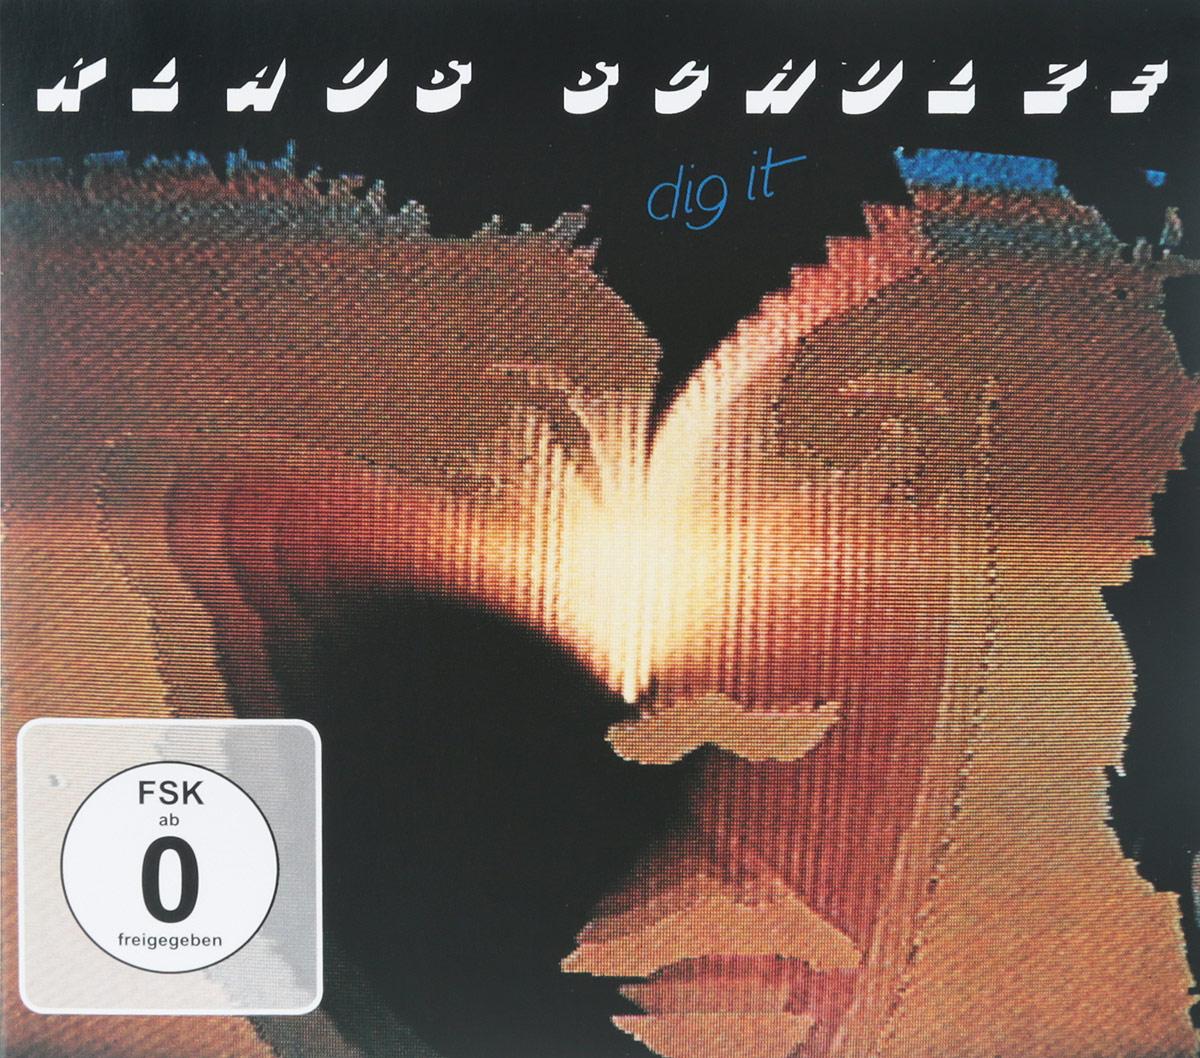 Klaus Schulze. Dig It (CD + DVD) 2016 2 CD + DVD